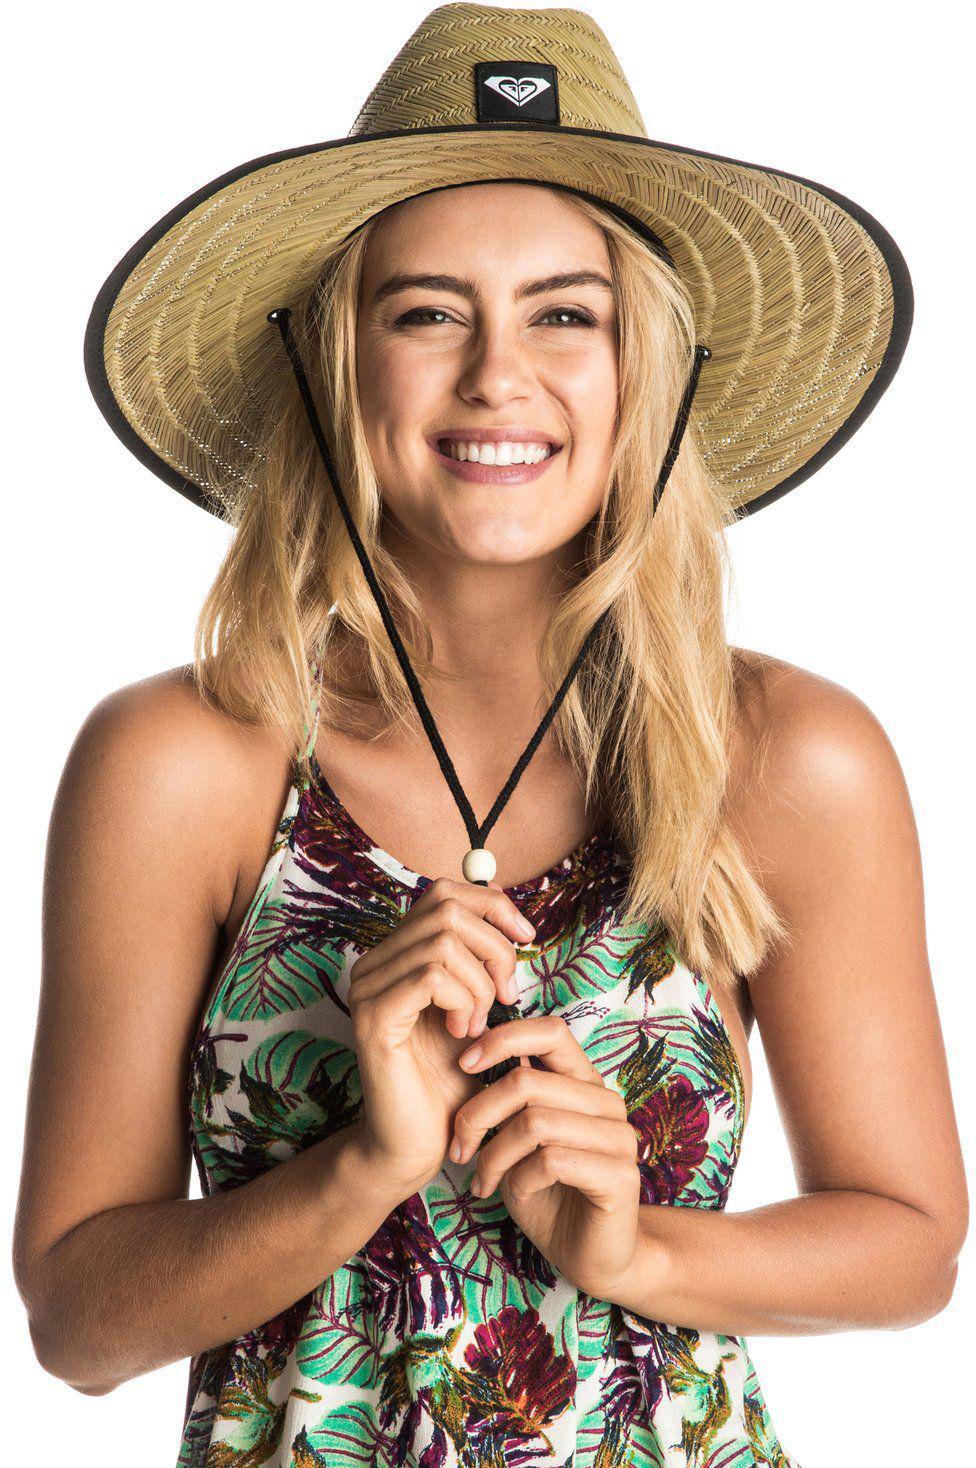 bddf0ff6c1de04 Roxy Tomboy 2 Straw Hat in Black - Lyst